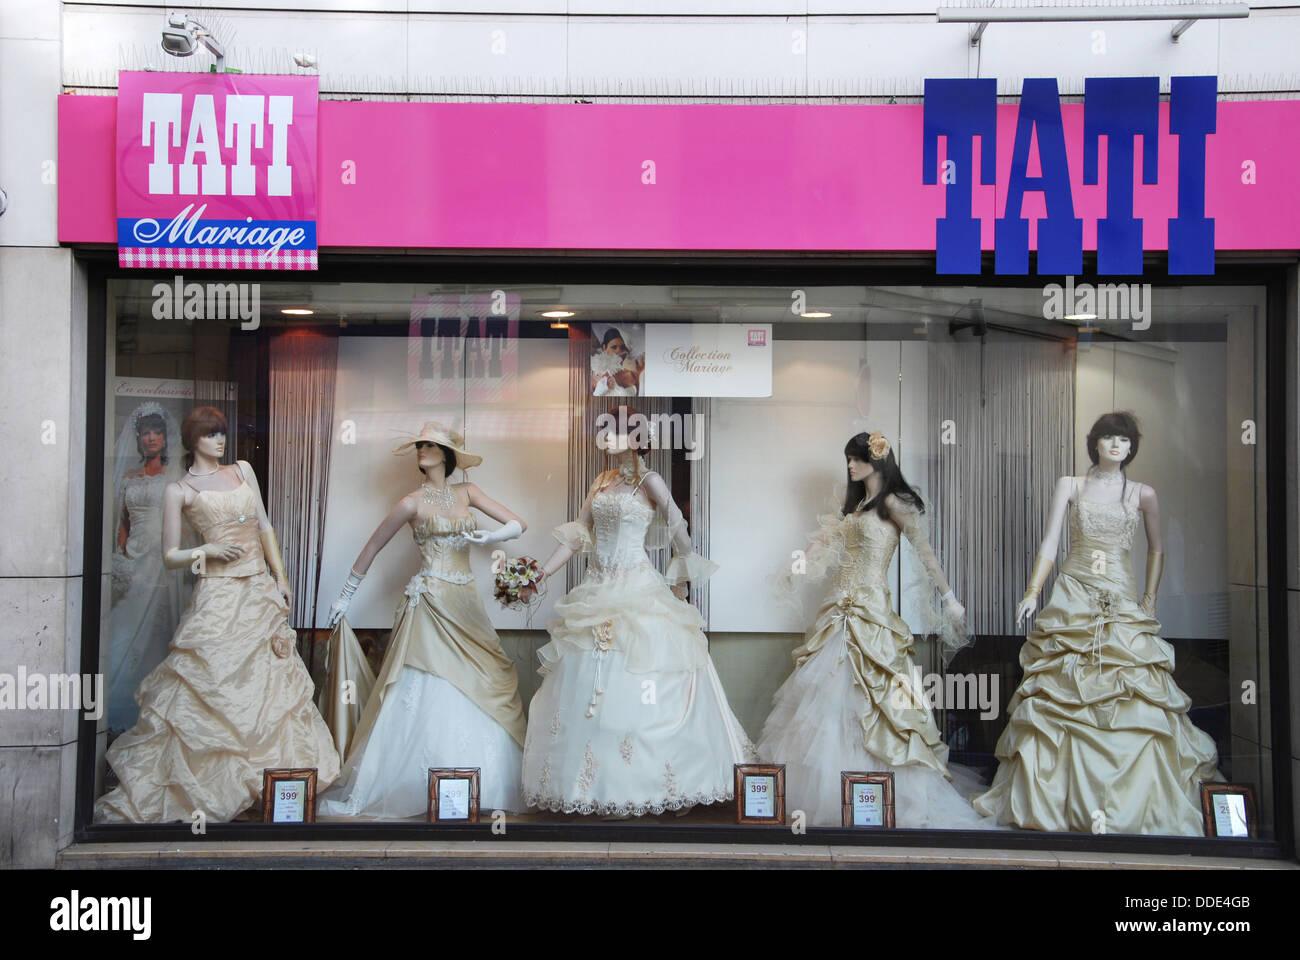 tati department store famous for its bargain prices paris france stock photo 59932555 alamy. Black Bedroom Furniture Sets. Home Design Ideas